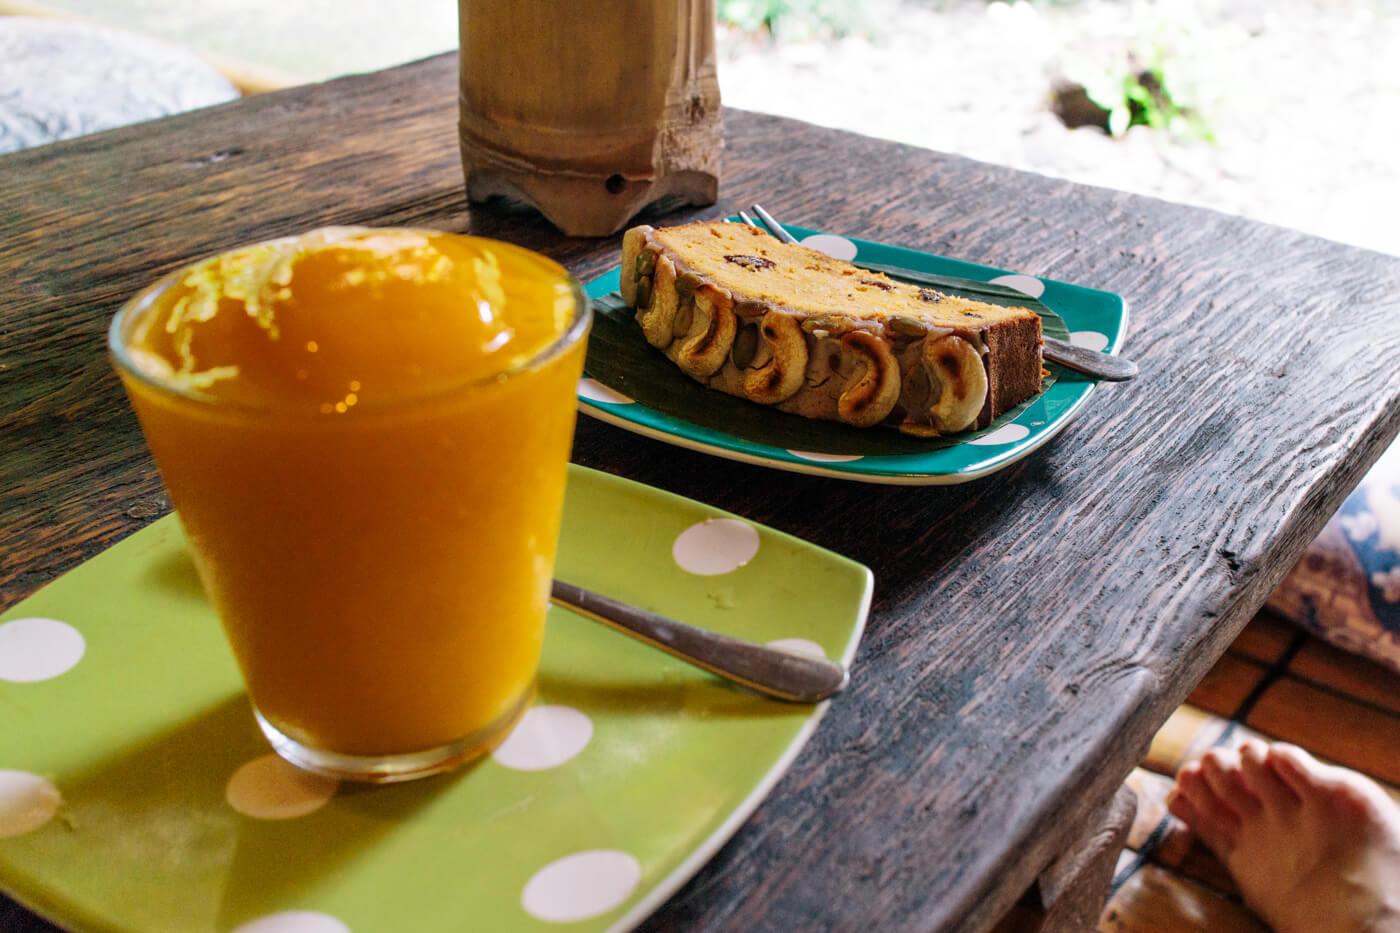 Kafe Topiの手作りケーキとマンゴースムージー